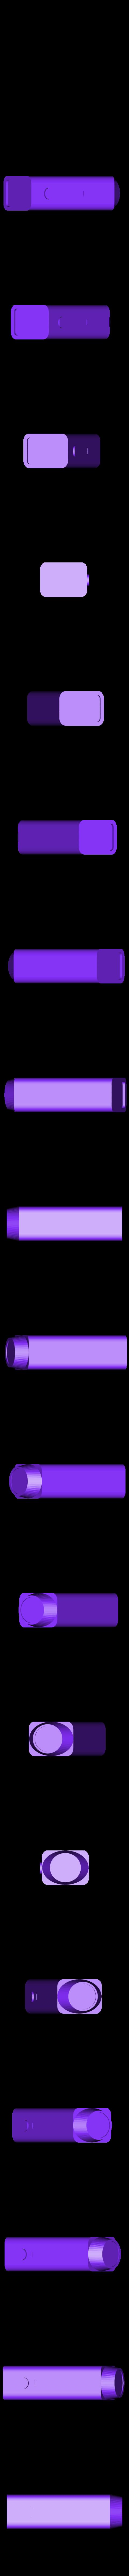 10_Pulserifle_Scope.stl Download free STL file Pulse Rifle • 3D printer template, Snorri